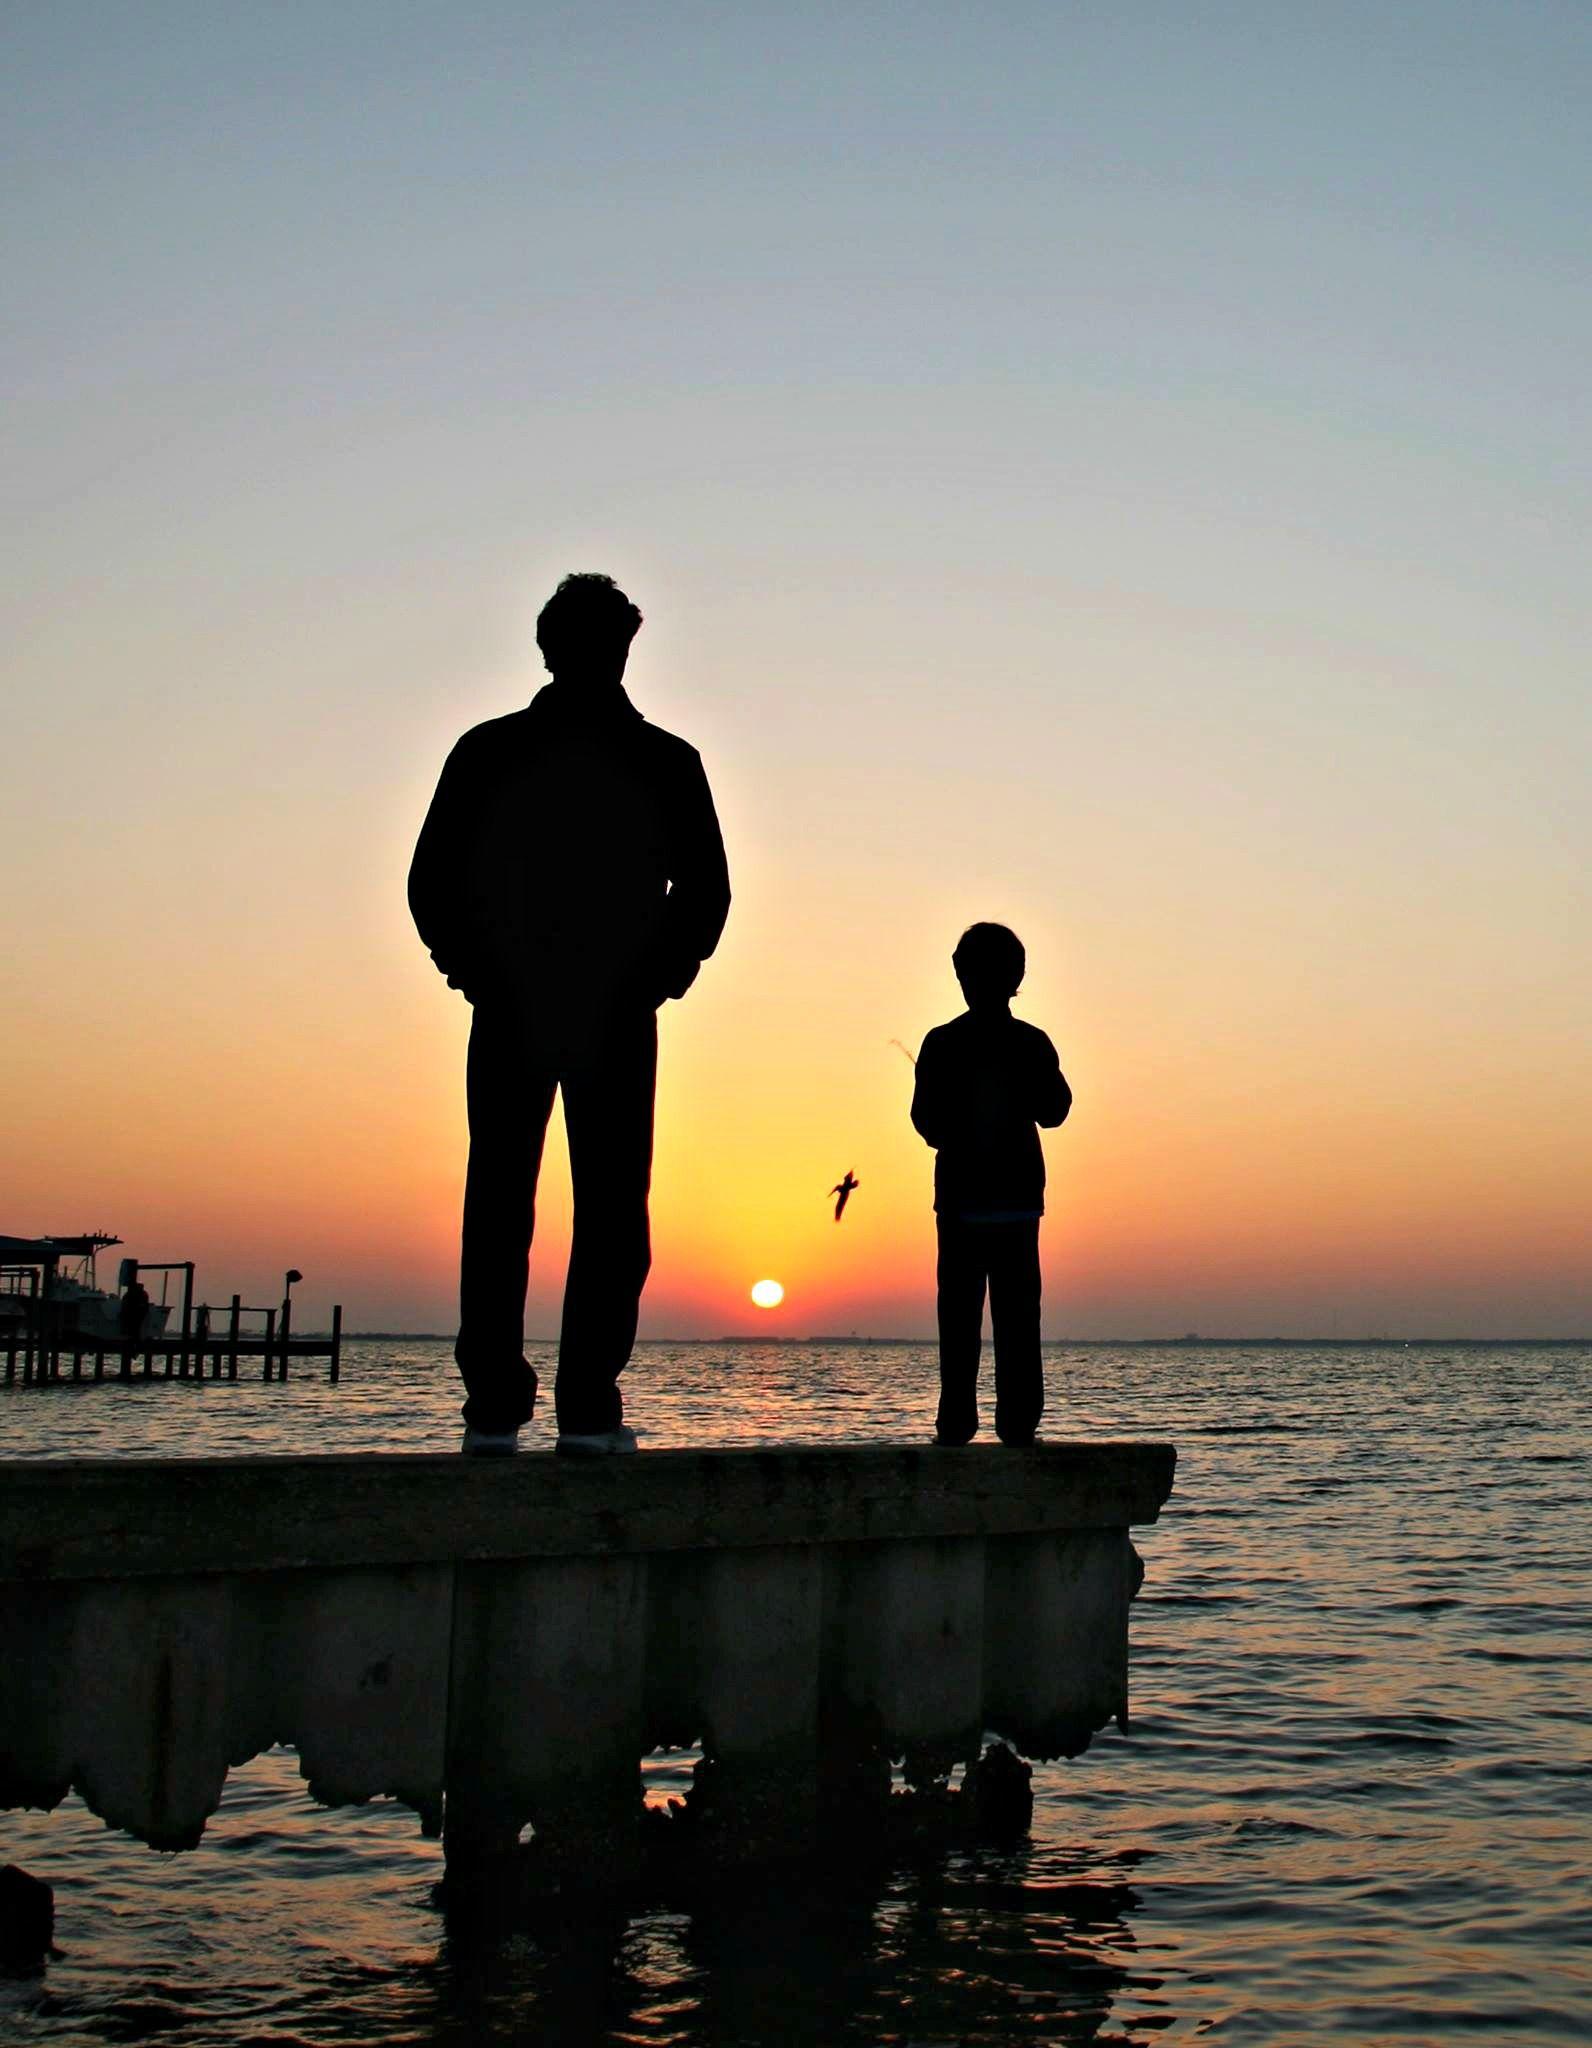 Pier Fishing At Sunset, Courtesy Of Florida's Emerald